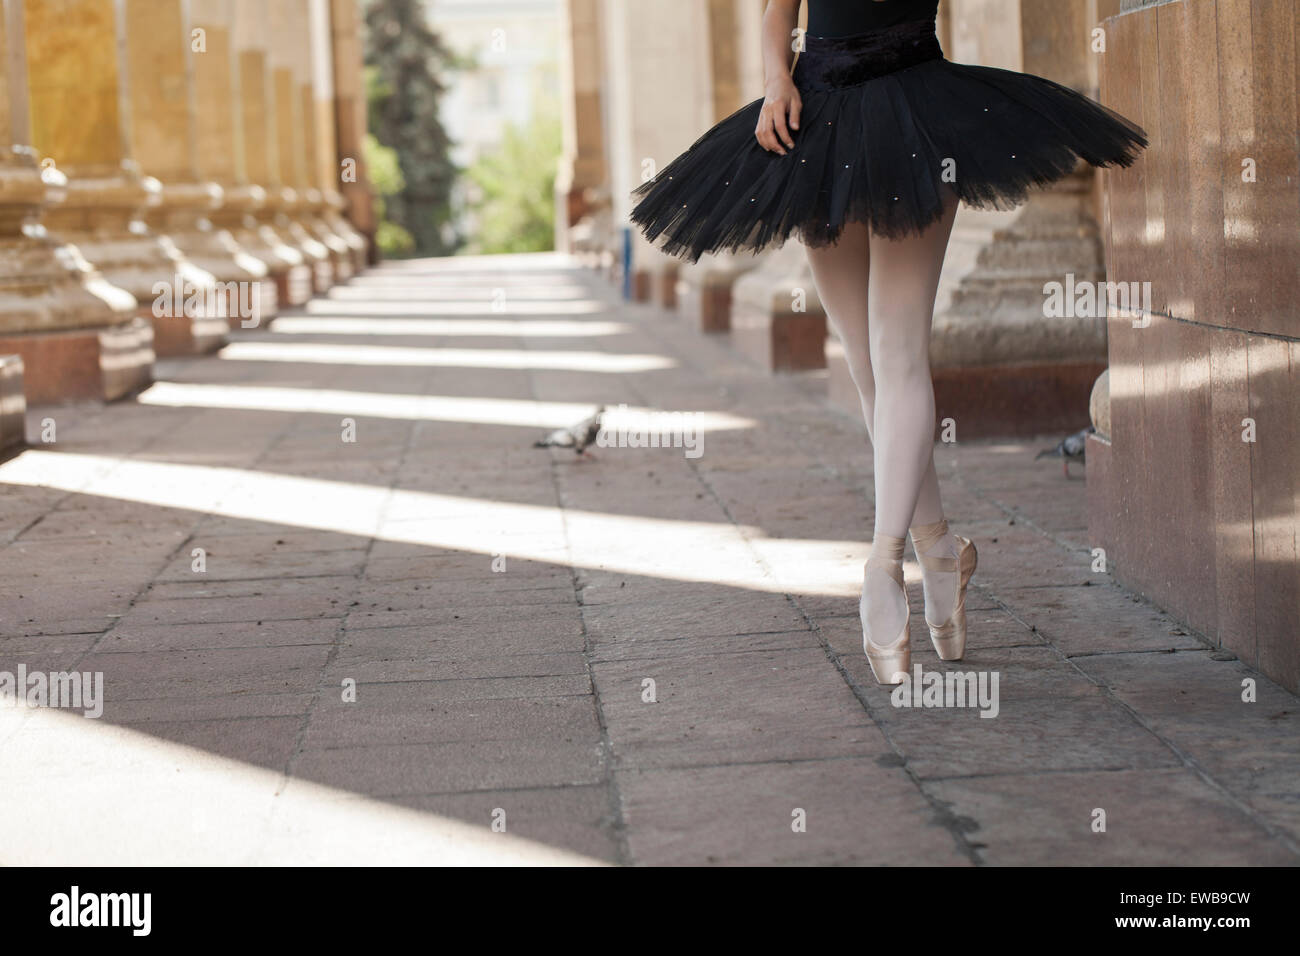 Girl ballerina flats standing on tiptoes - Stock Image